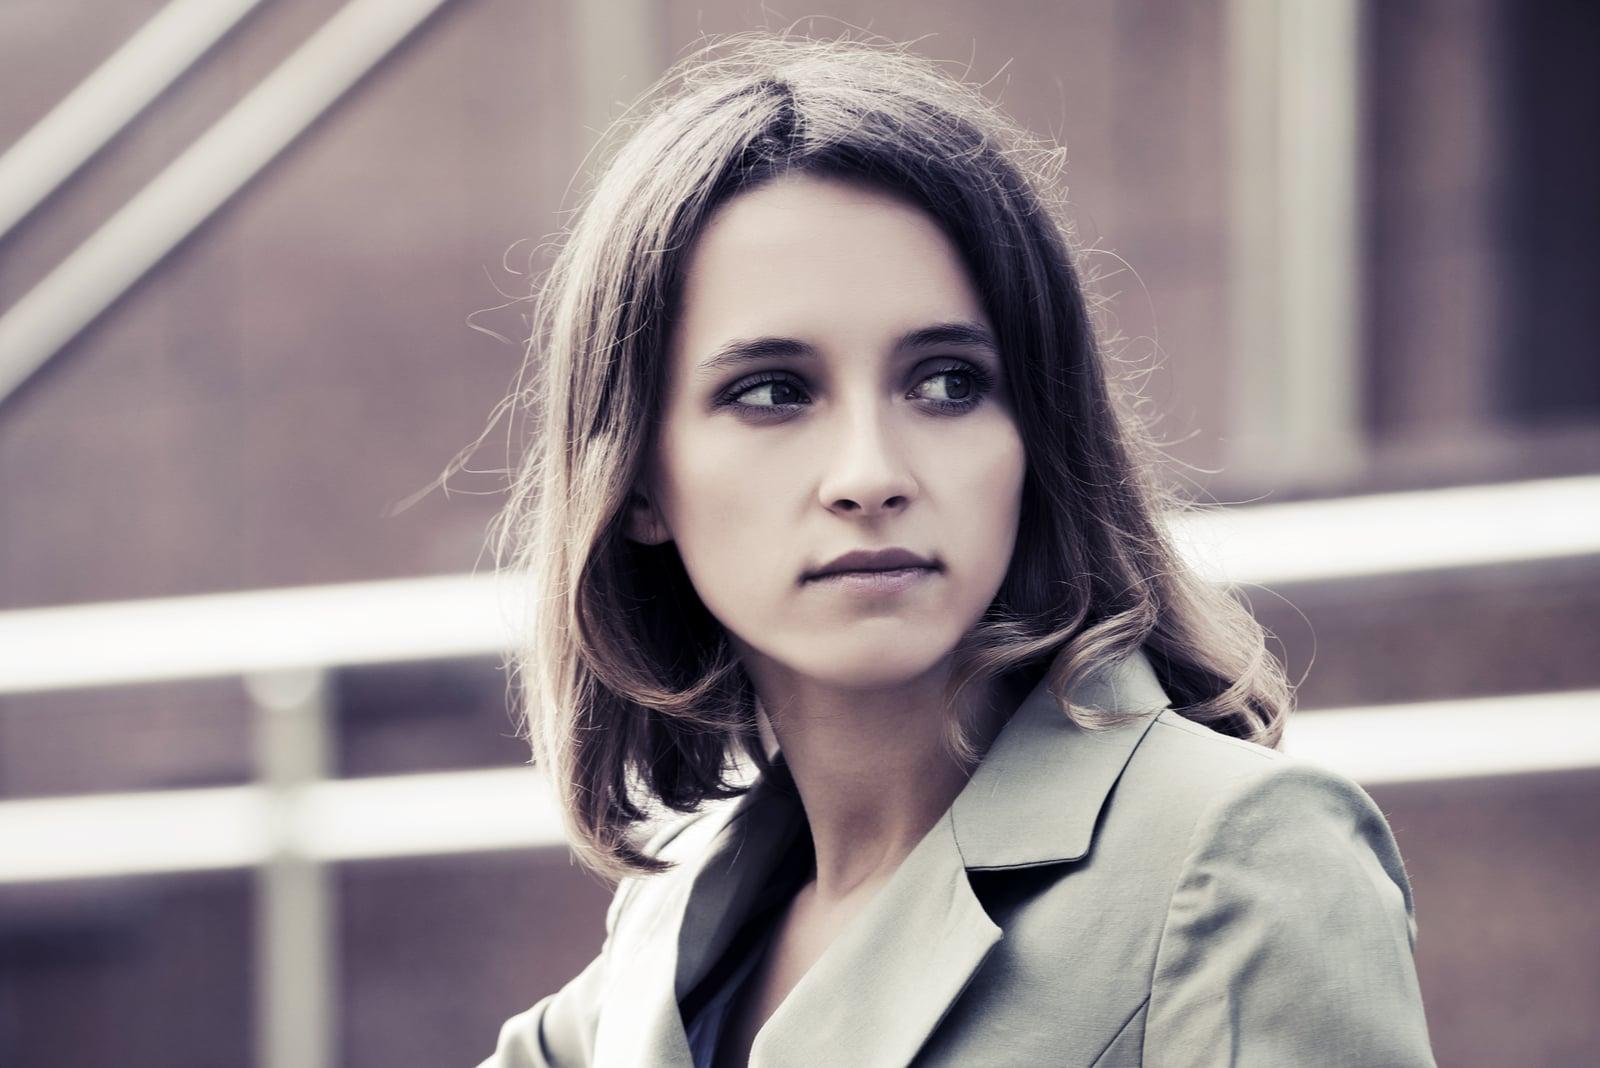 fashion woman in gray blazer looking away